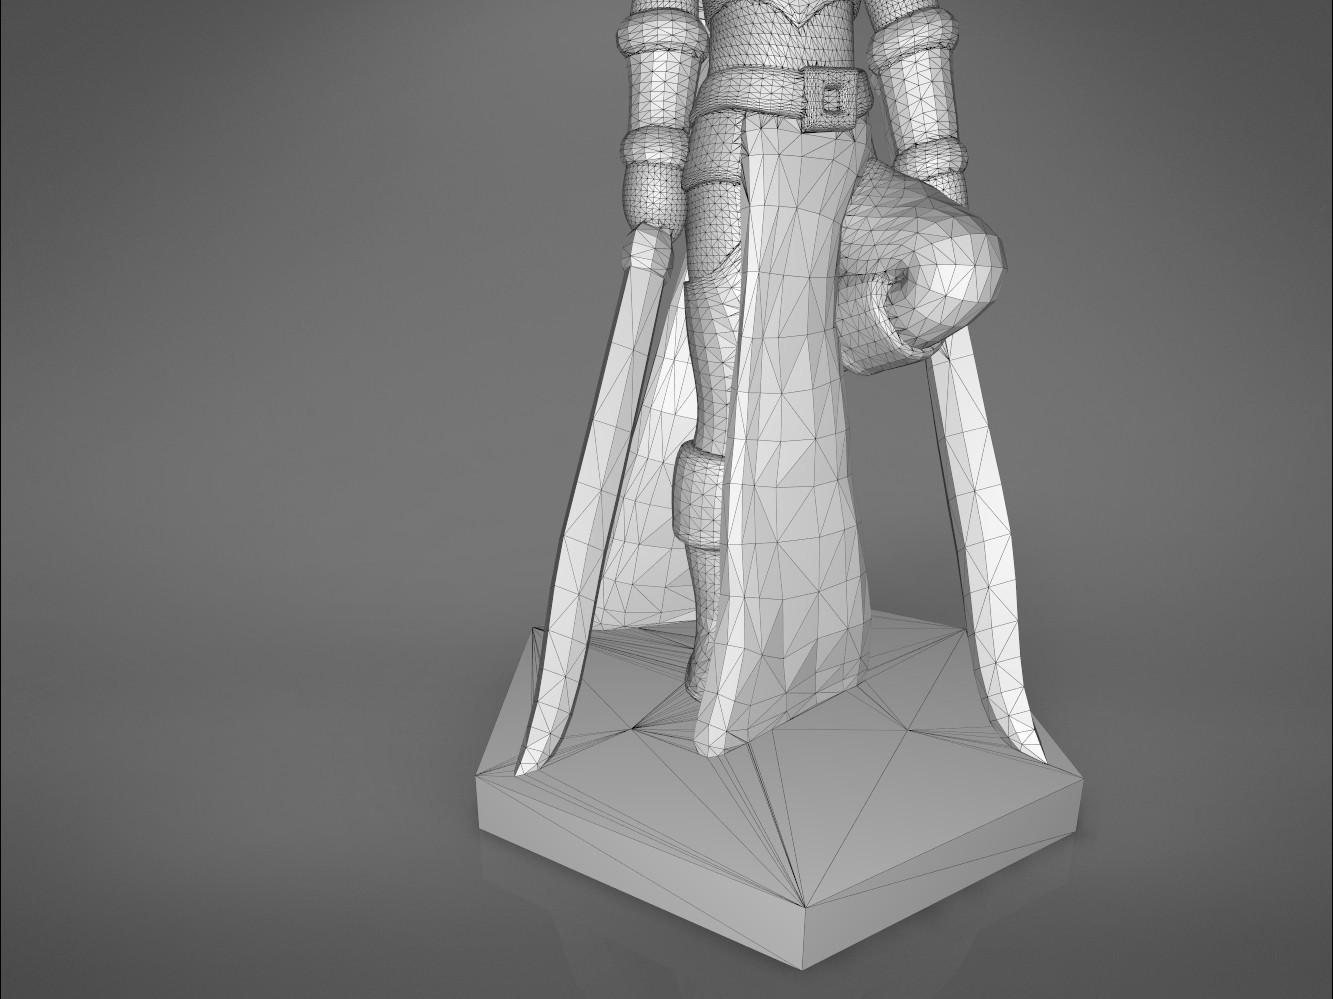 Warrior_2-detail_2.345.jpg Download STL file ELF WARRIOR FEMALE CHARACTER GAME FIGURE 3D print model • 3D printing object, 3D-mon